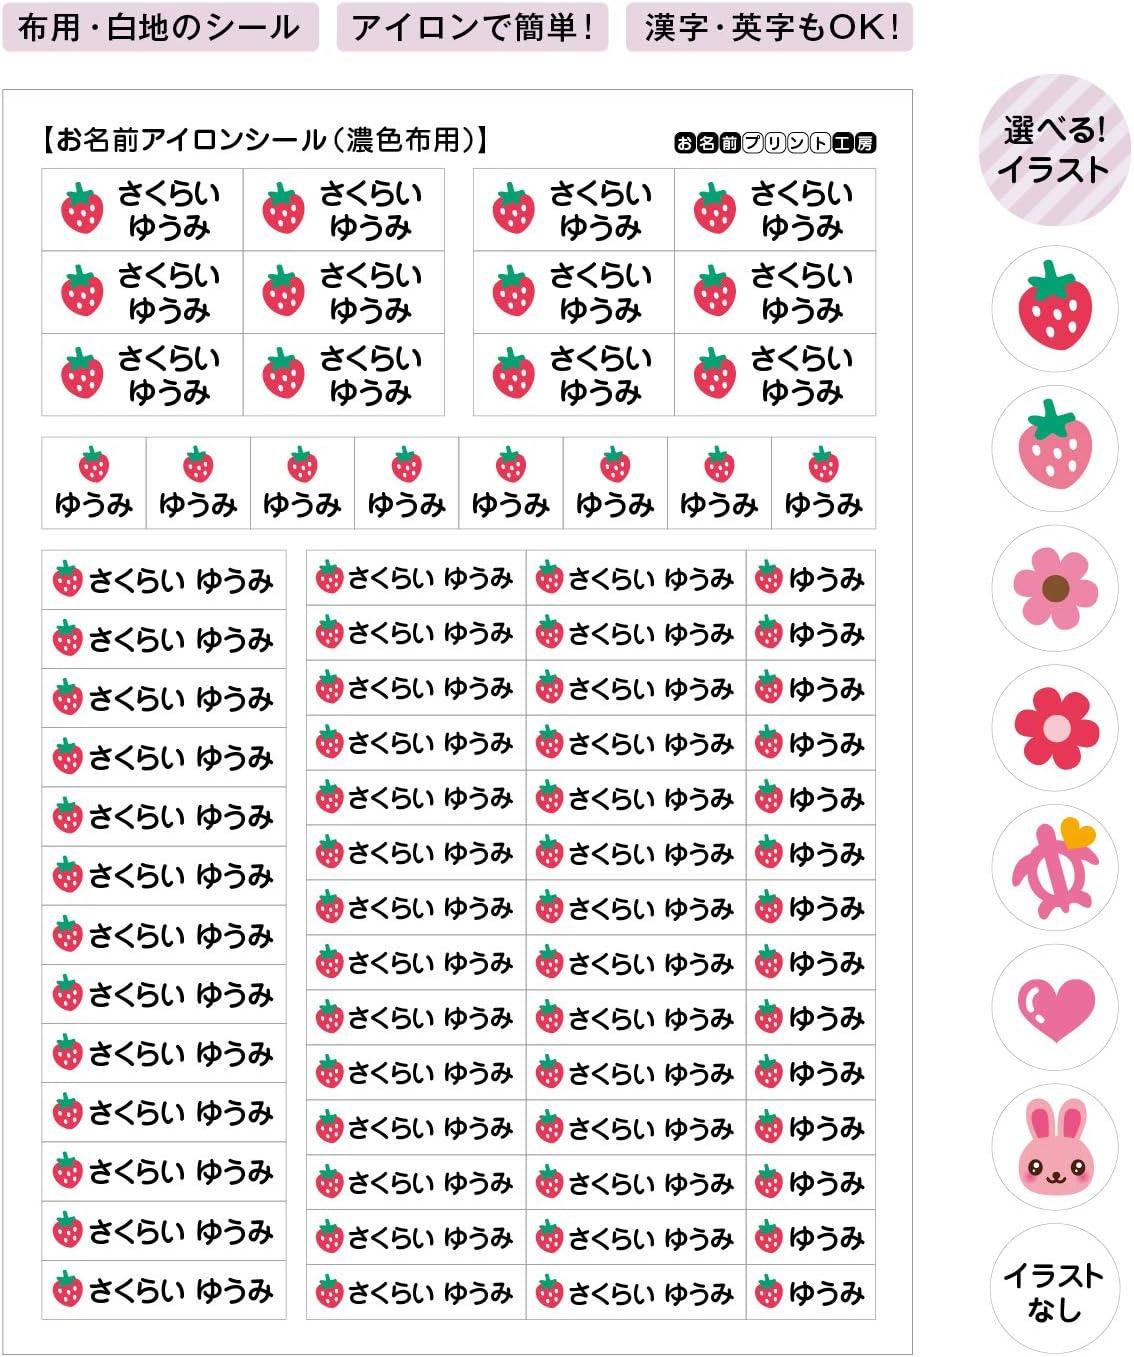 Amazon.co.jp: かわいい!お名前アイロンシール【濃色布用】女の子75 ...